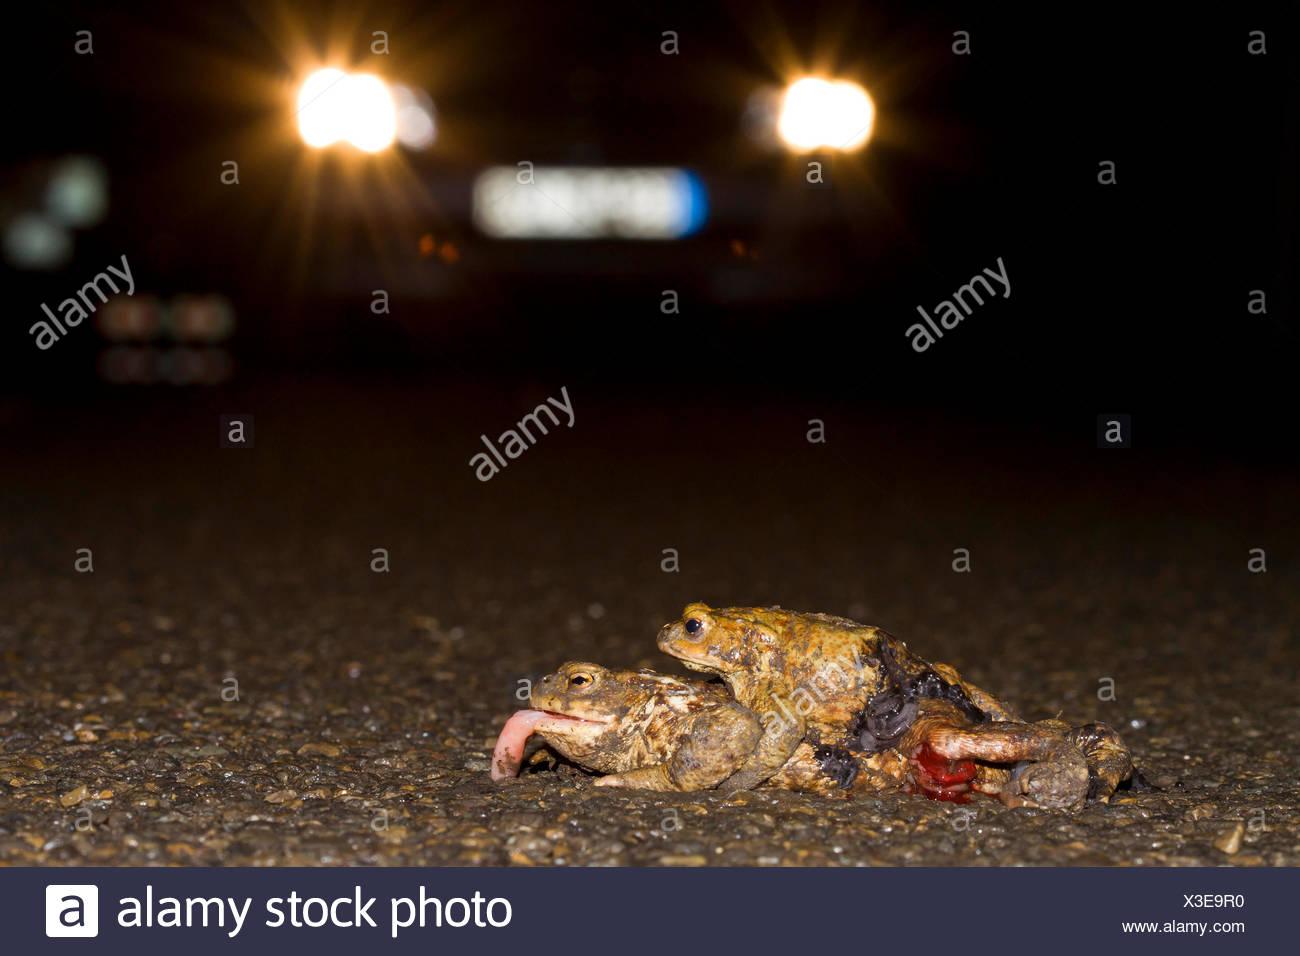 Erdkroete, Erd-Kroete (Bufo bufo), ueberfahrenes Paar auf einer Strasse, Deutschland | European common toad (Bufo bufo), roadkil Stock Photo